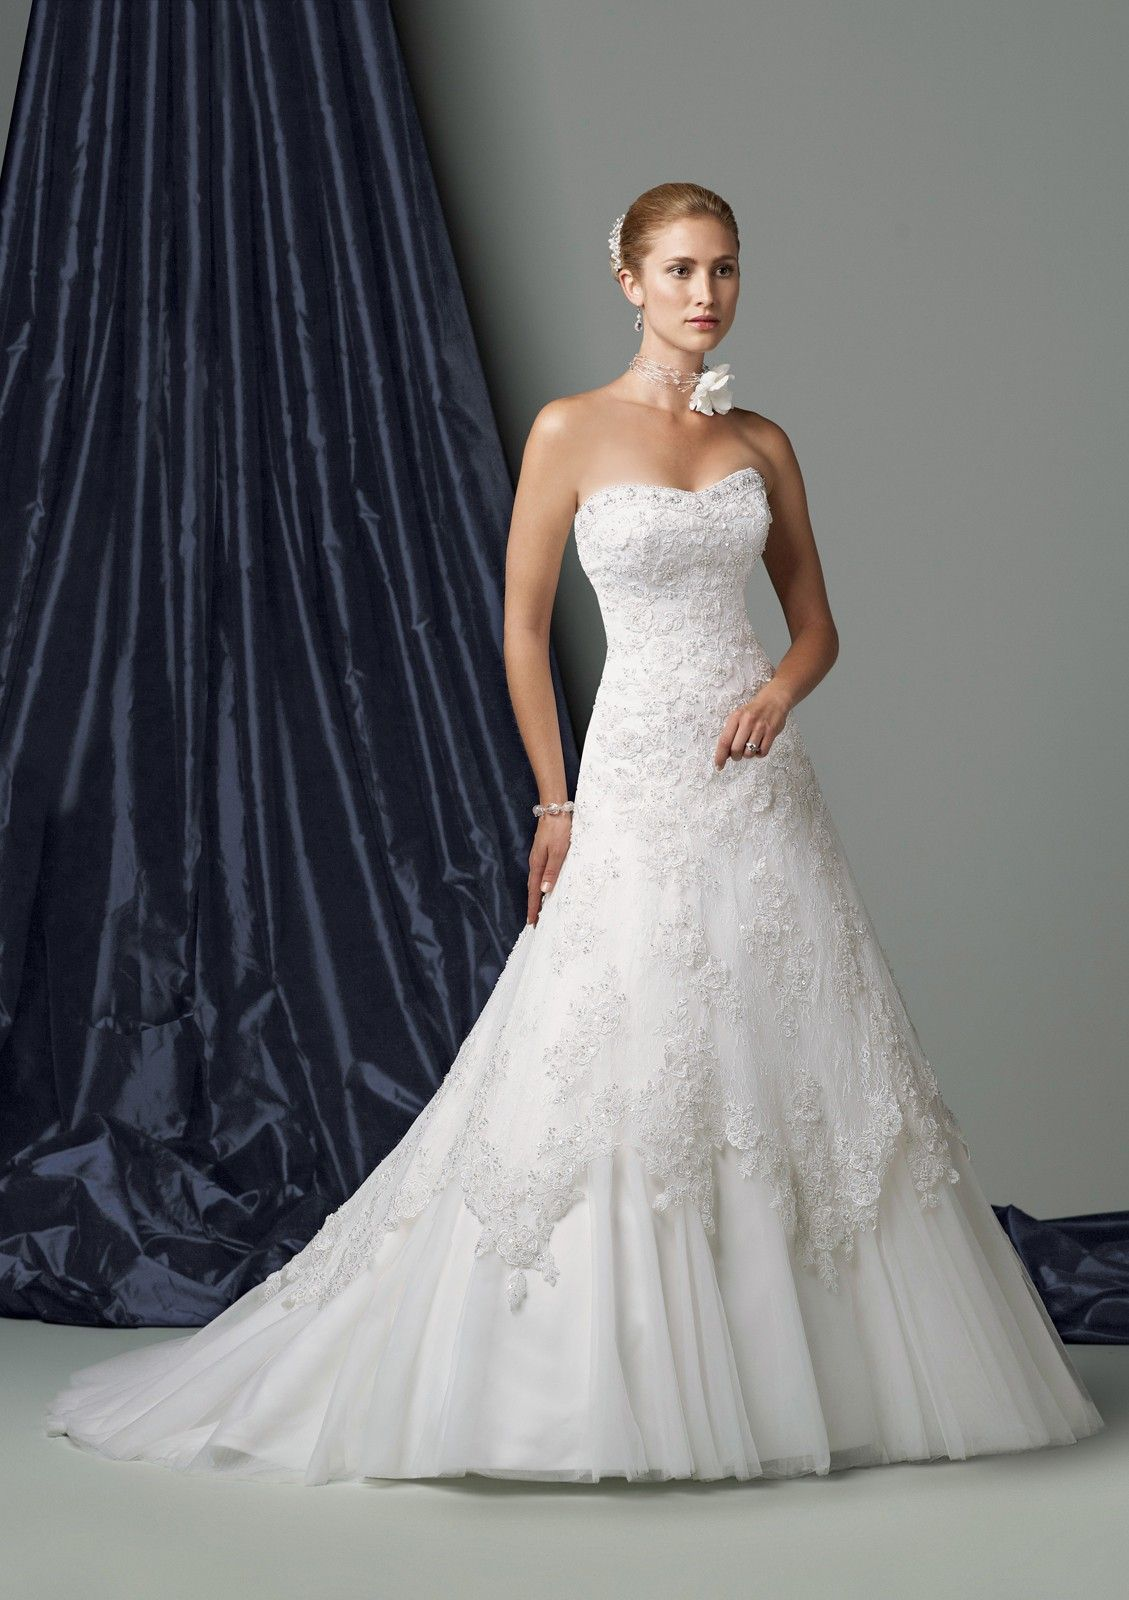 Strapless wedding dresses are the brides 1 dress choice stylekuw strapless wedding dresses are the brides 1 dress choice stylekuw junglespirit Gallery